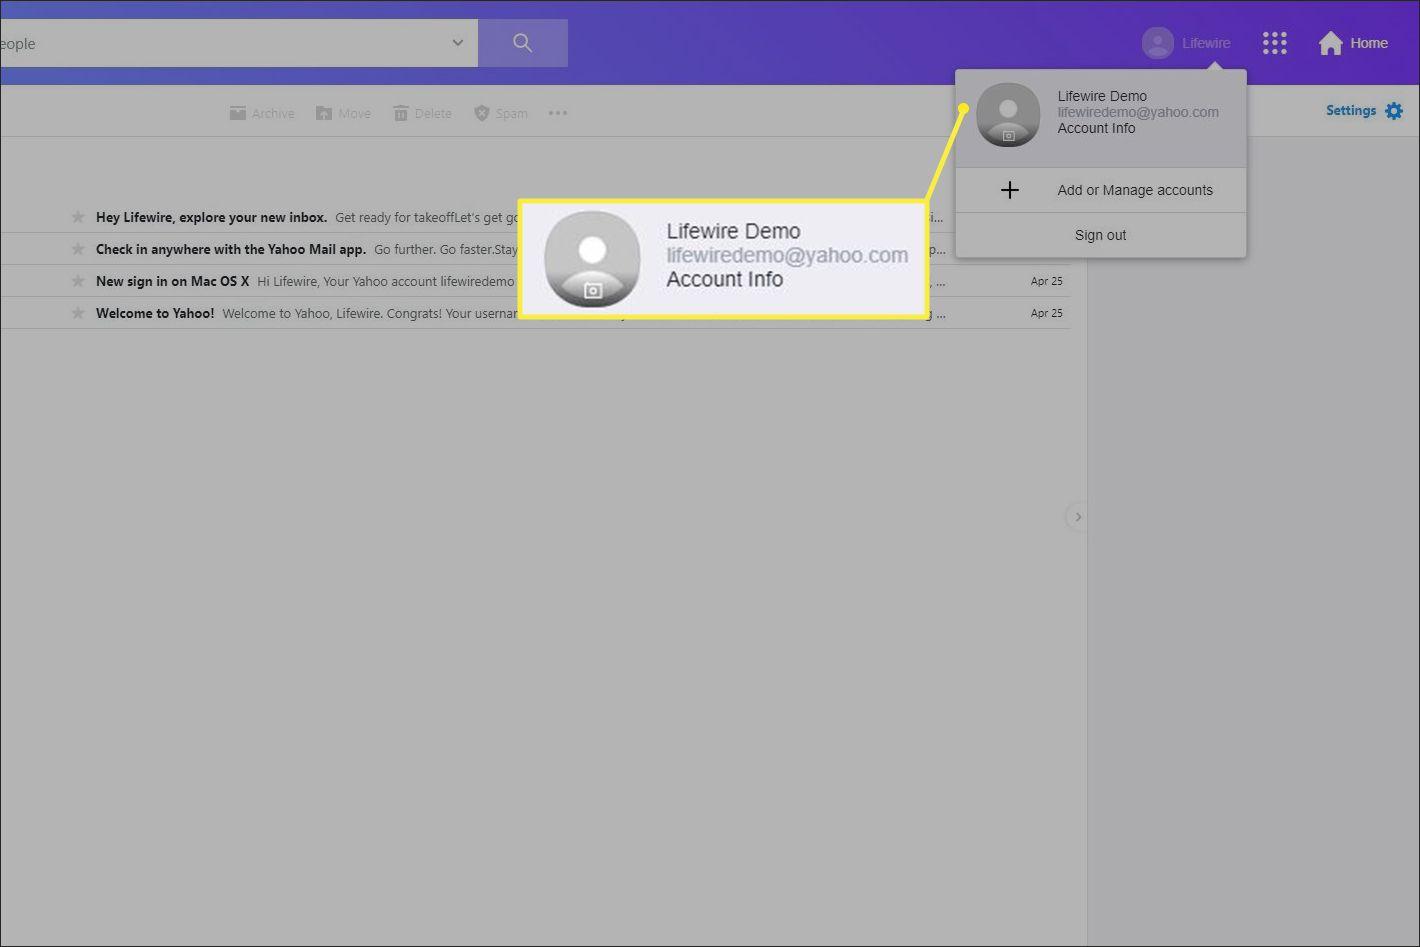 Yahoo Account Info in menu